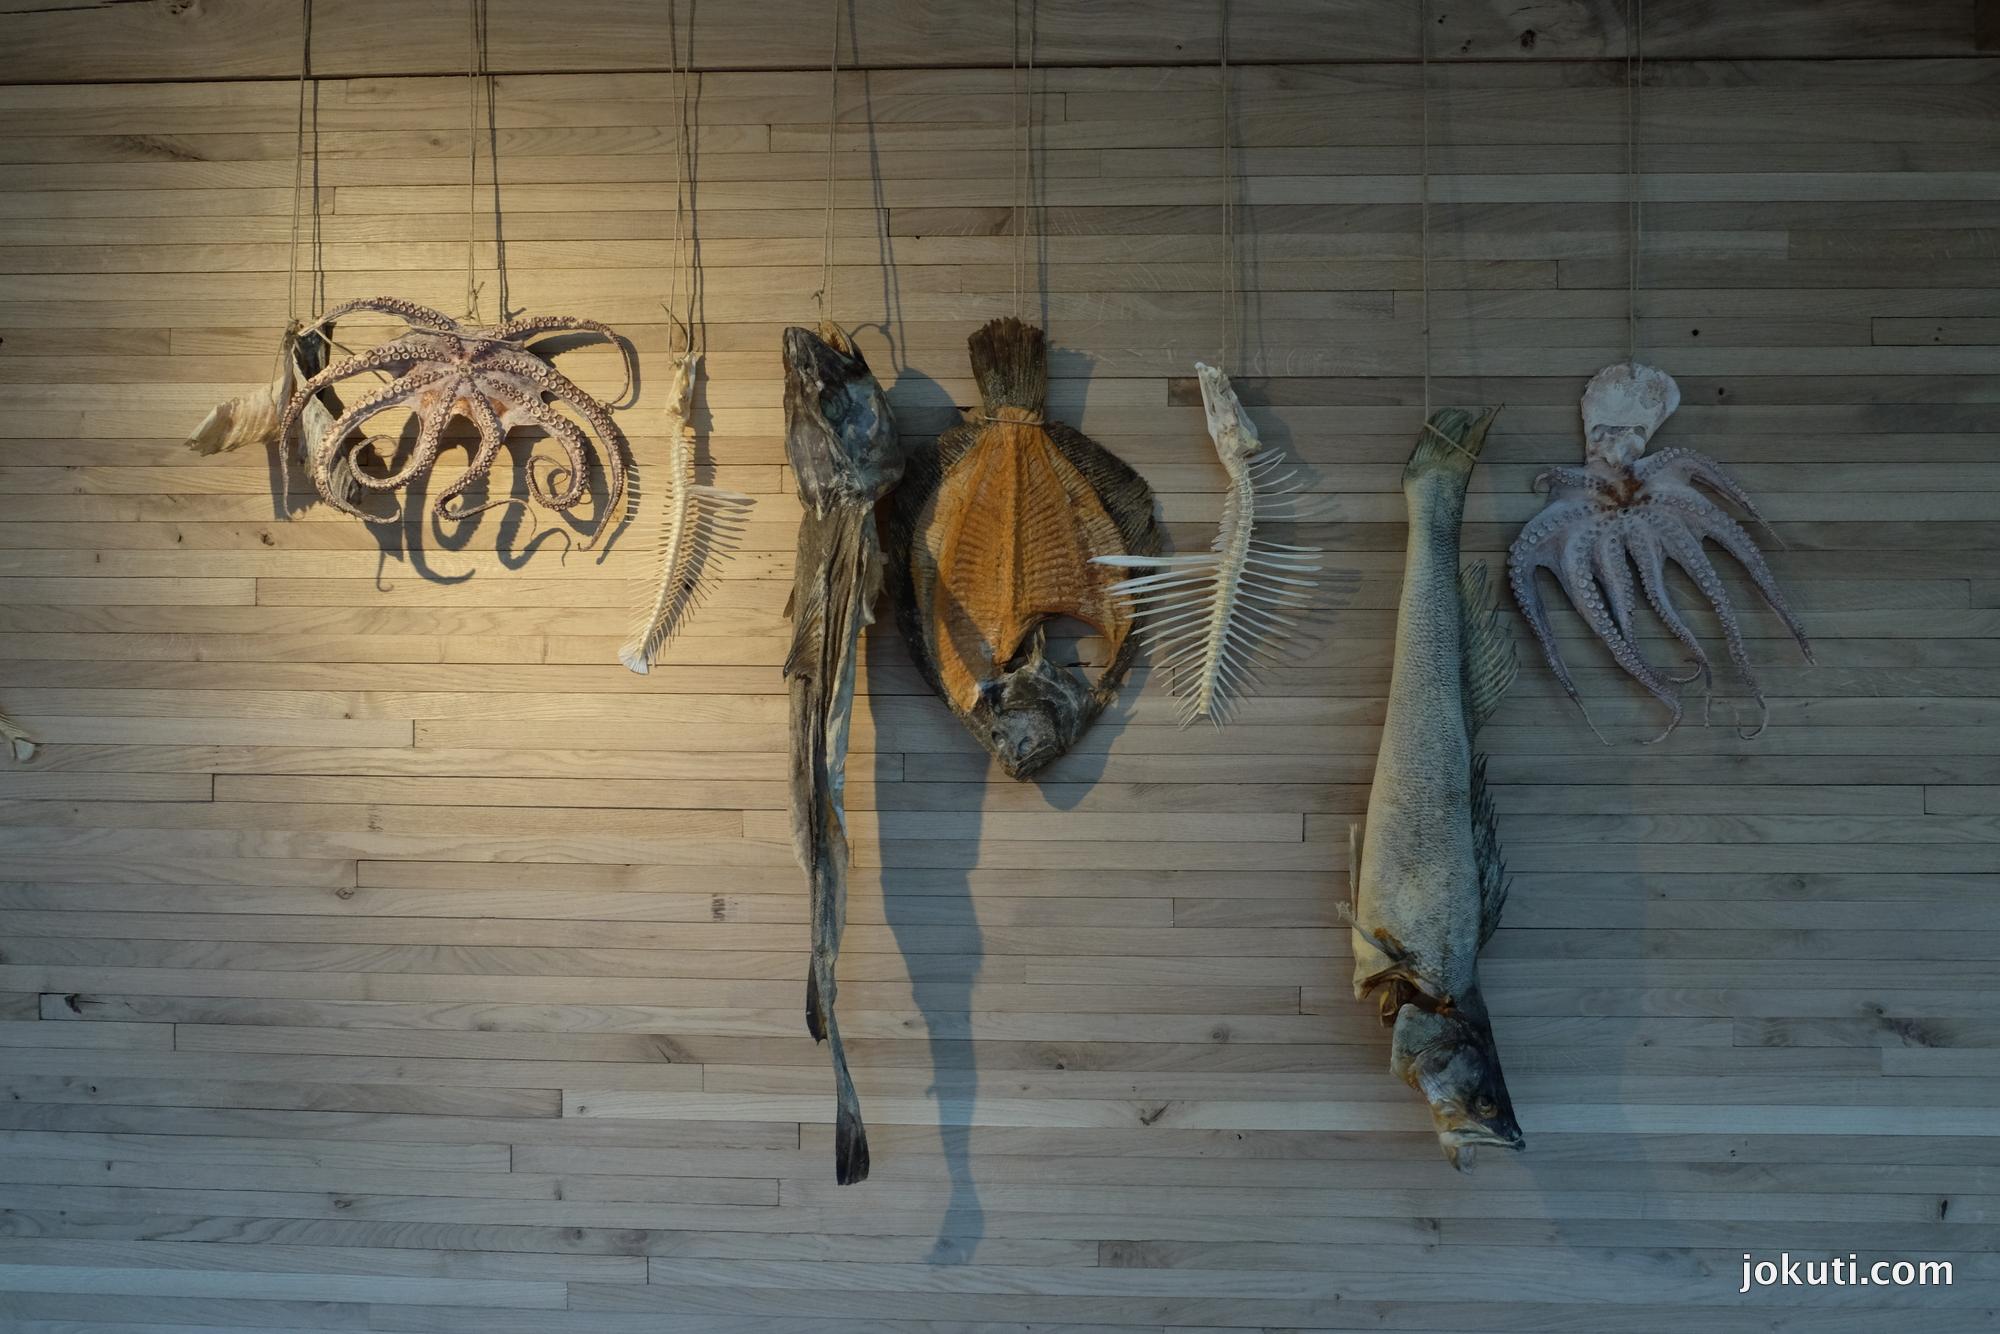 dscf5594-001_noma_nomaocean_redzepi_seafood_copenhagen_restaurant_vilagevo_jokuti.jpg